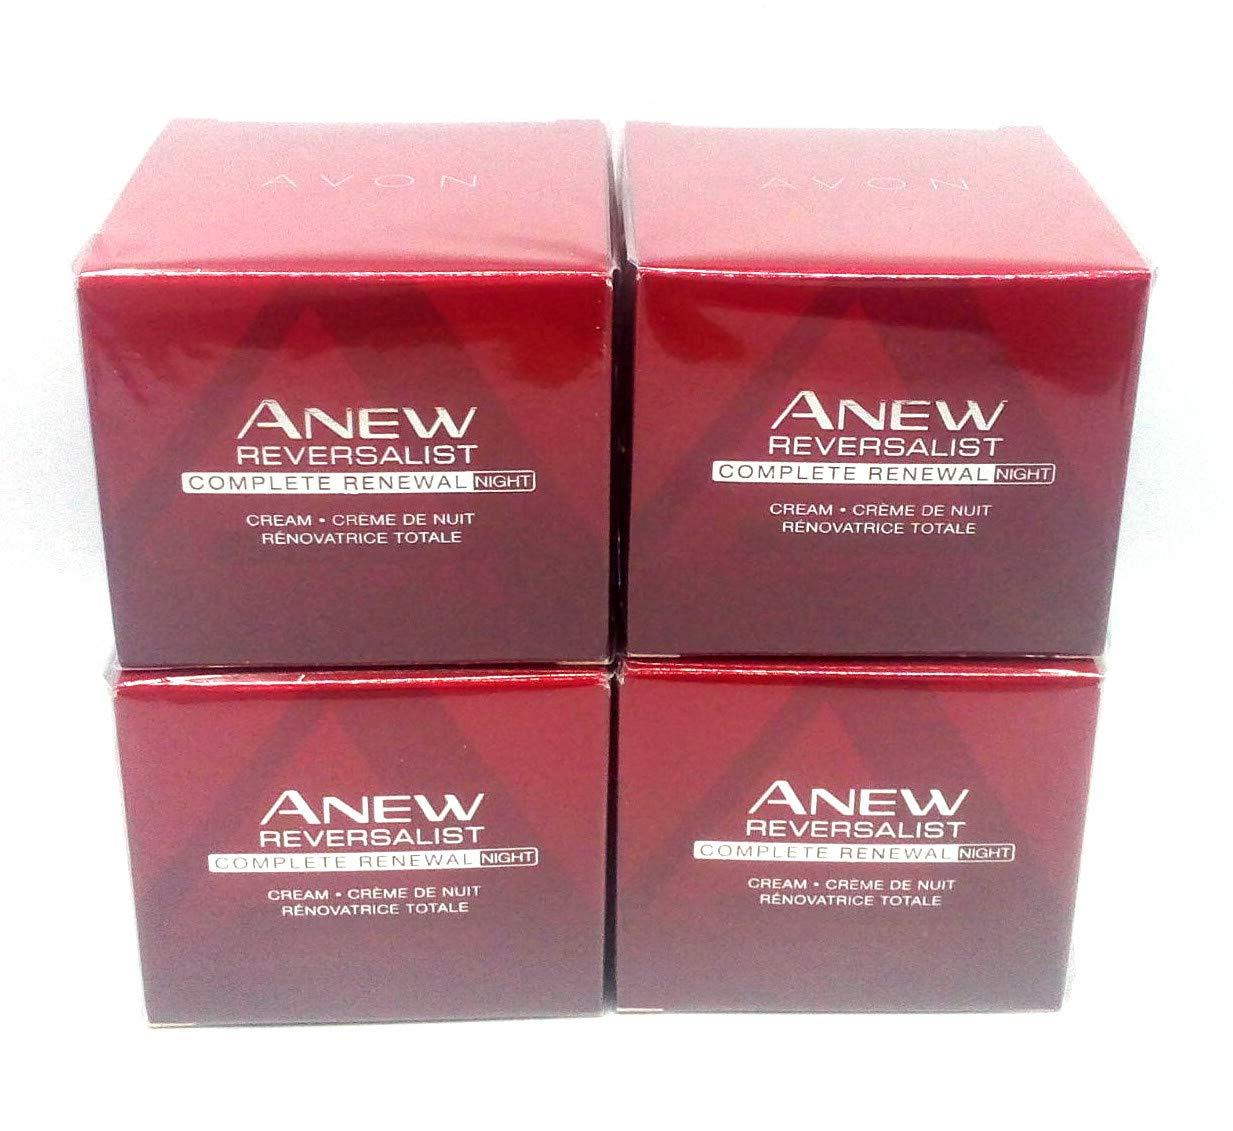 4 x AVON Anew Reversalist Complete Renewal Night Cream 50ml - 1.7oz SET ! RW-US-AVON-135